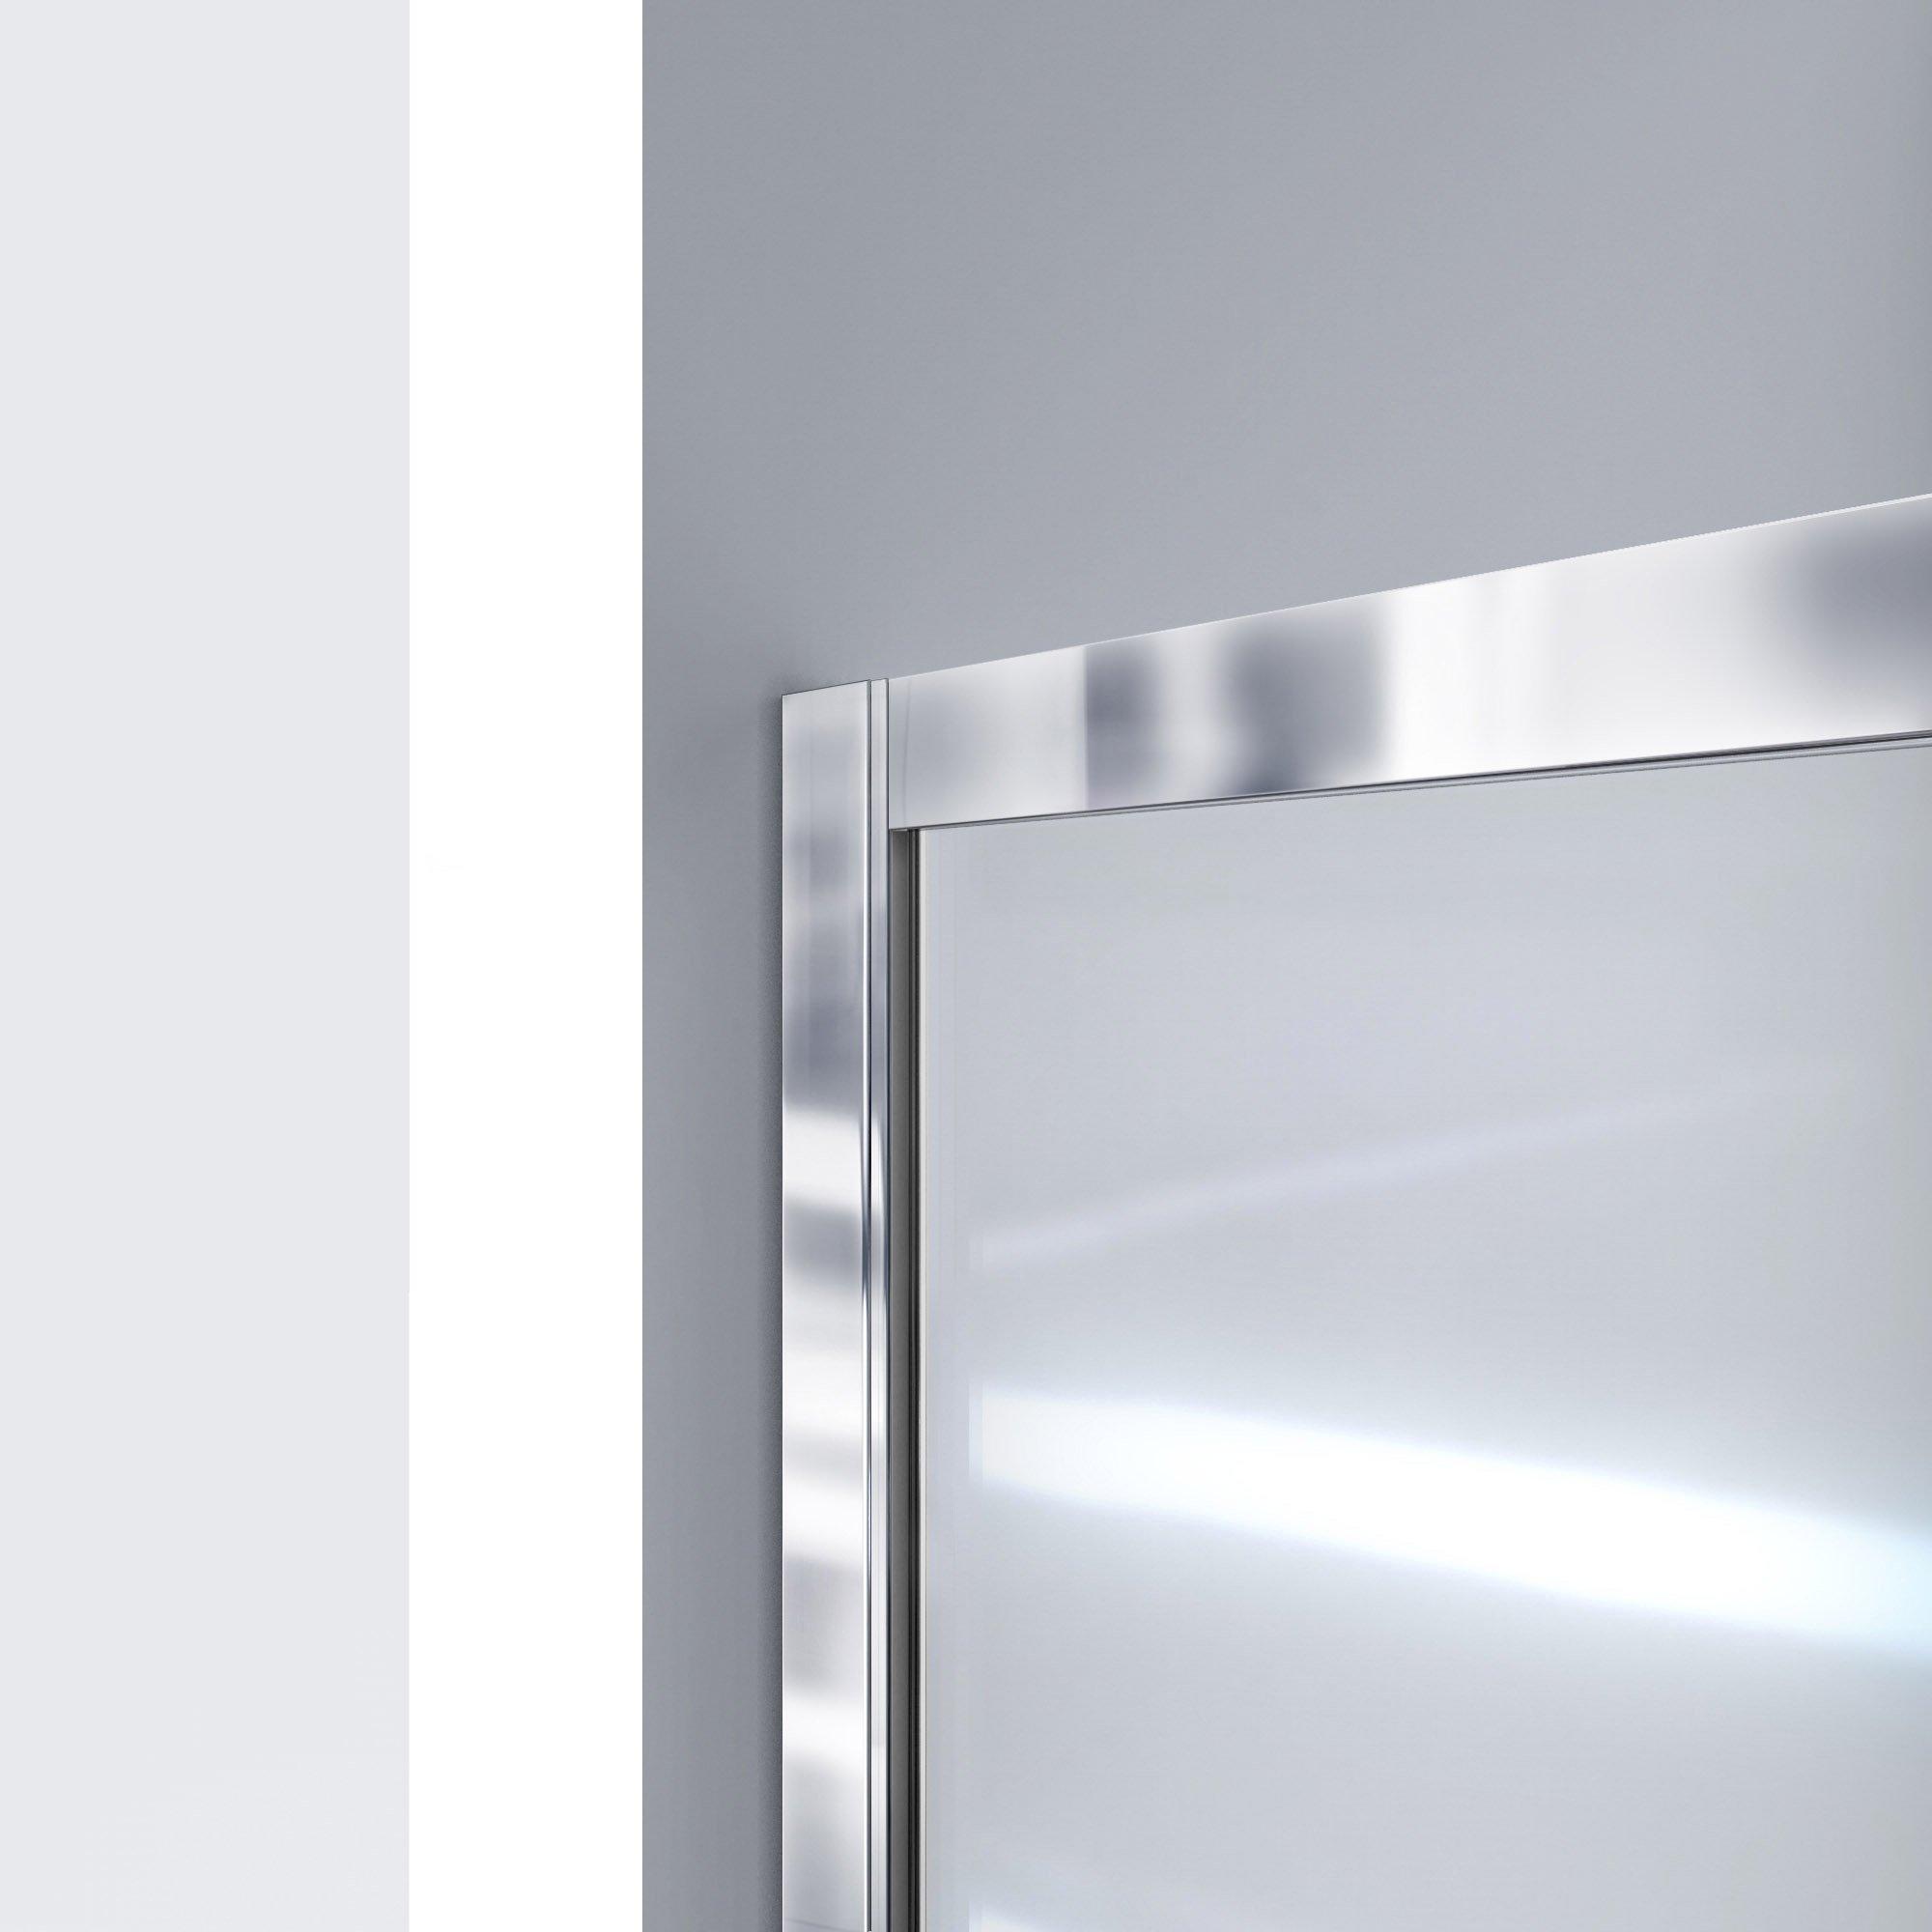 DreamLine Infinity-Z 50-54 in. W x 72 in. H Semi-Frameless Sliding Shower Door, Clear Glass in Brushed Nickel, SHDR-0954720-04 by DreamLine (Image #6)